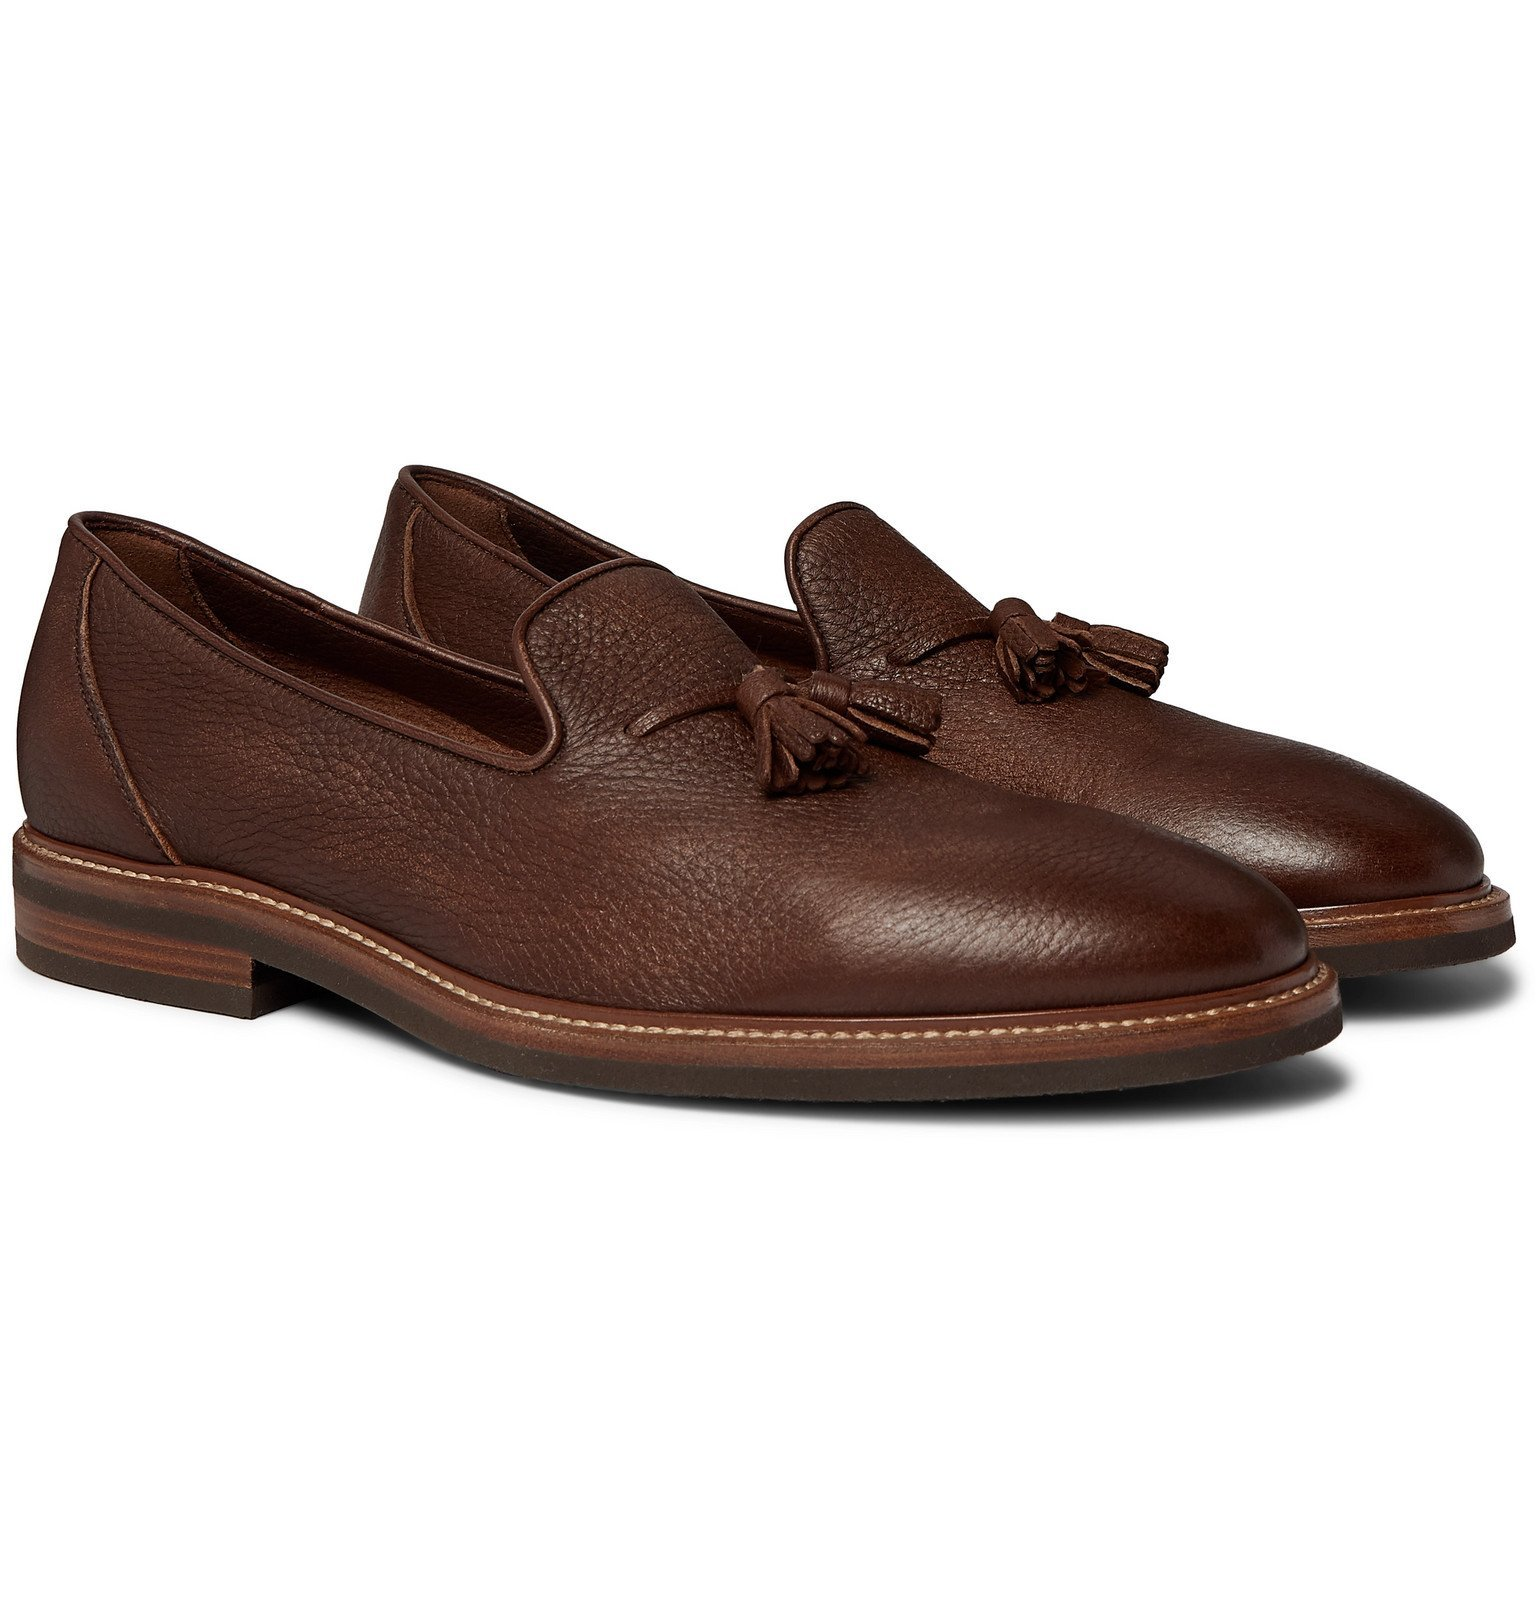 Photo: Brunello Cucinelli - Full-Grain Leather Tasselled Loafers - Brown